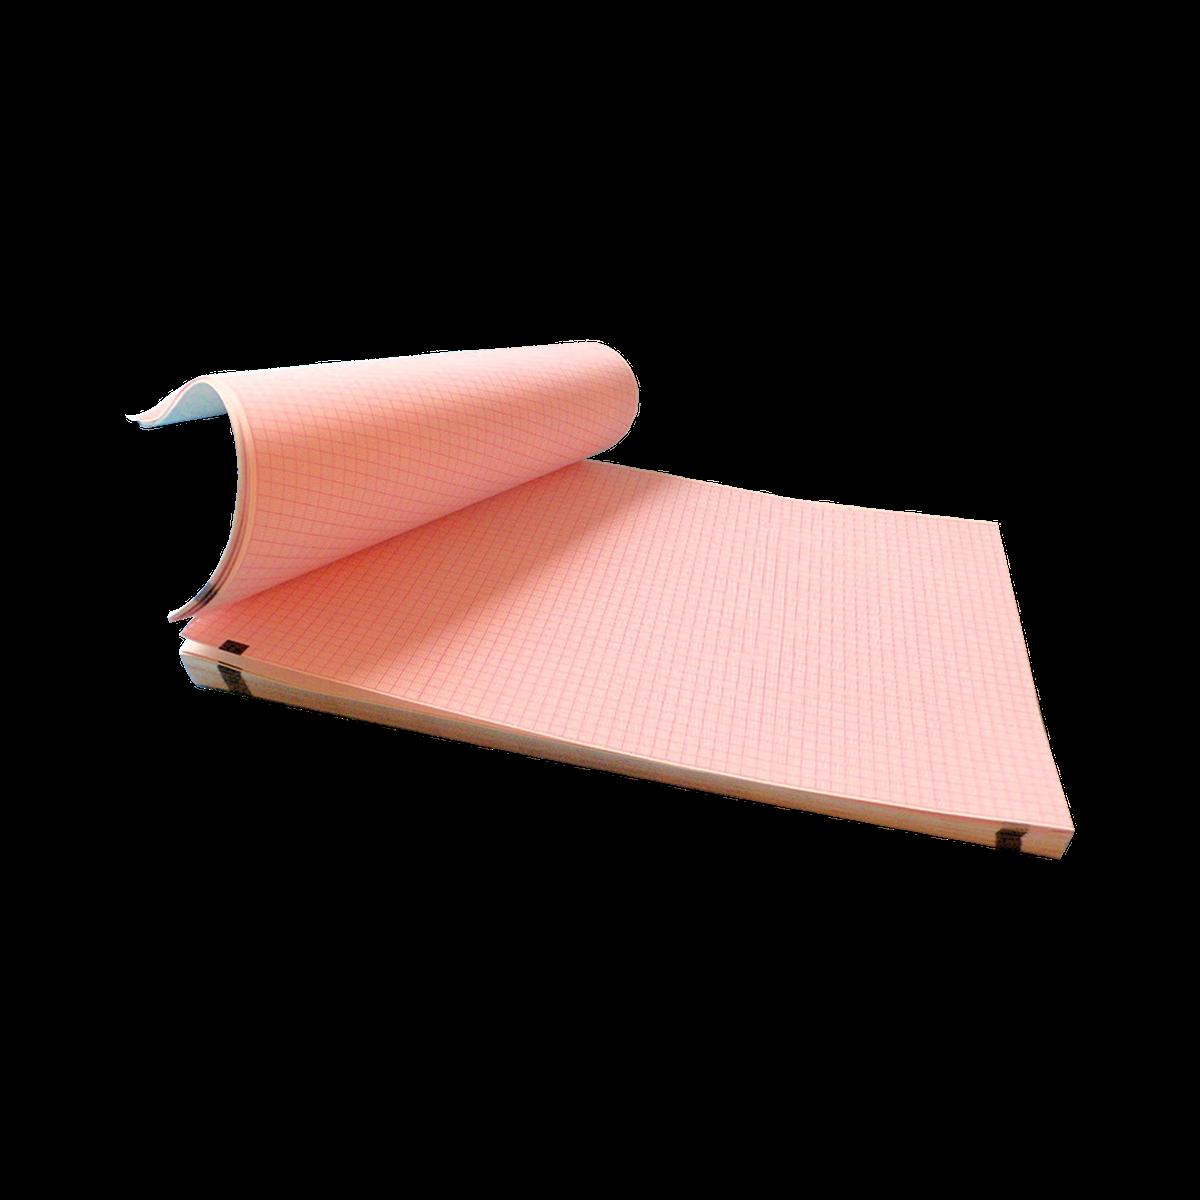 210х300х150, бумага ЭКГ для Cardiosmart  MAC-1200, реестр  4160